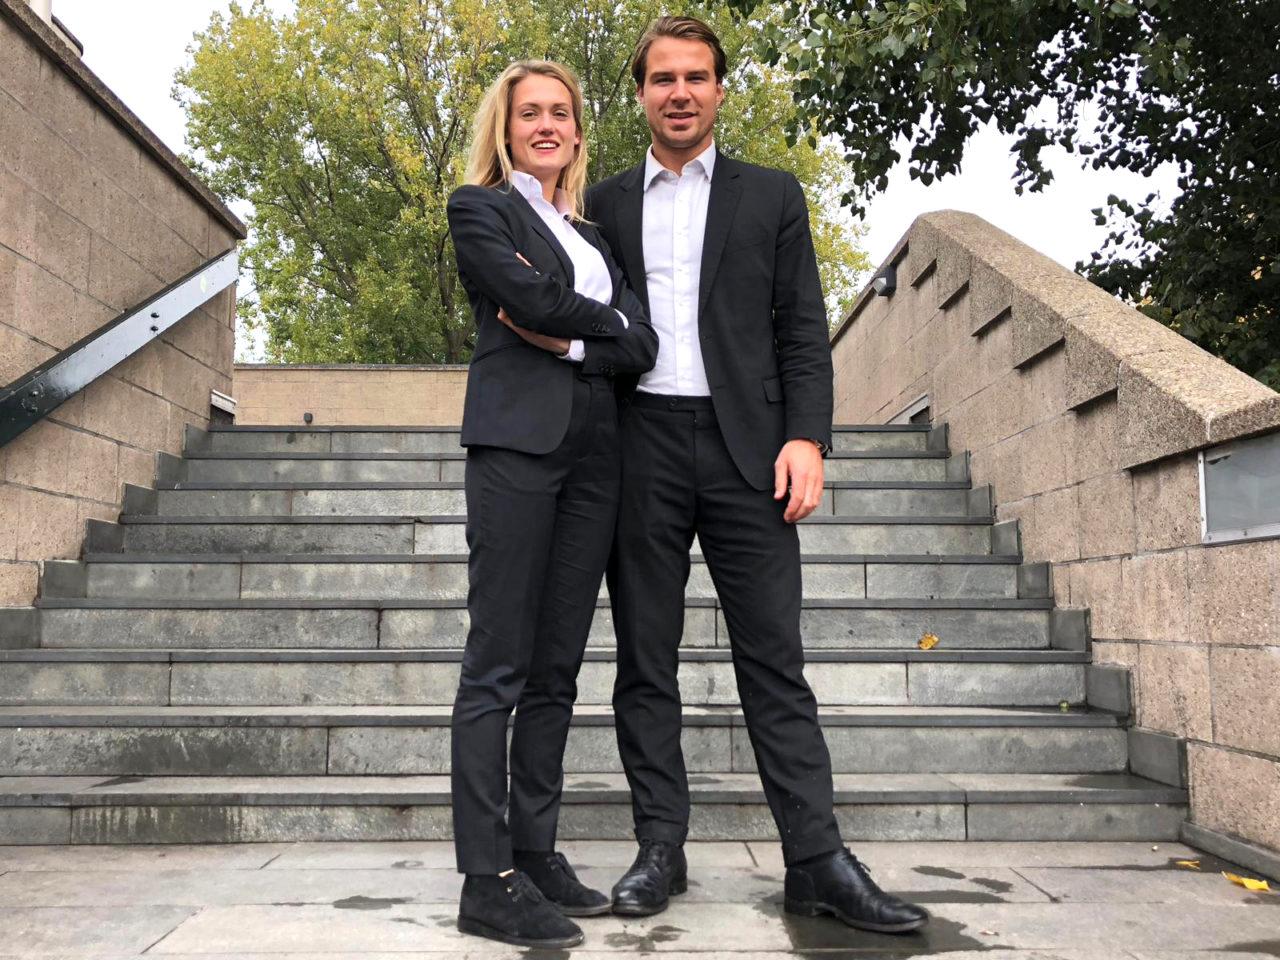 RSC/RVSV-president Amber Schothorst en vice-president Stijn-Houben